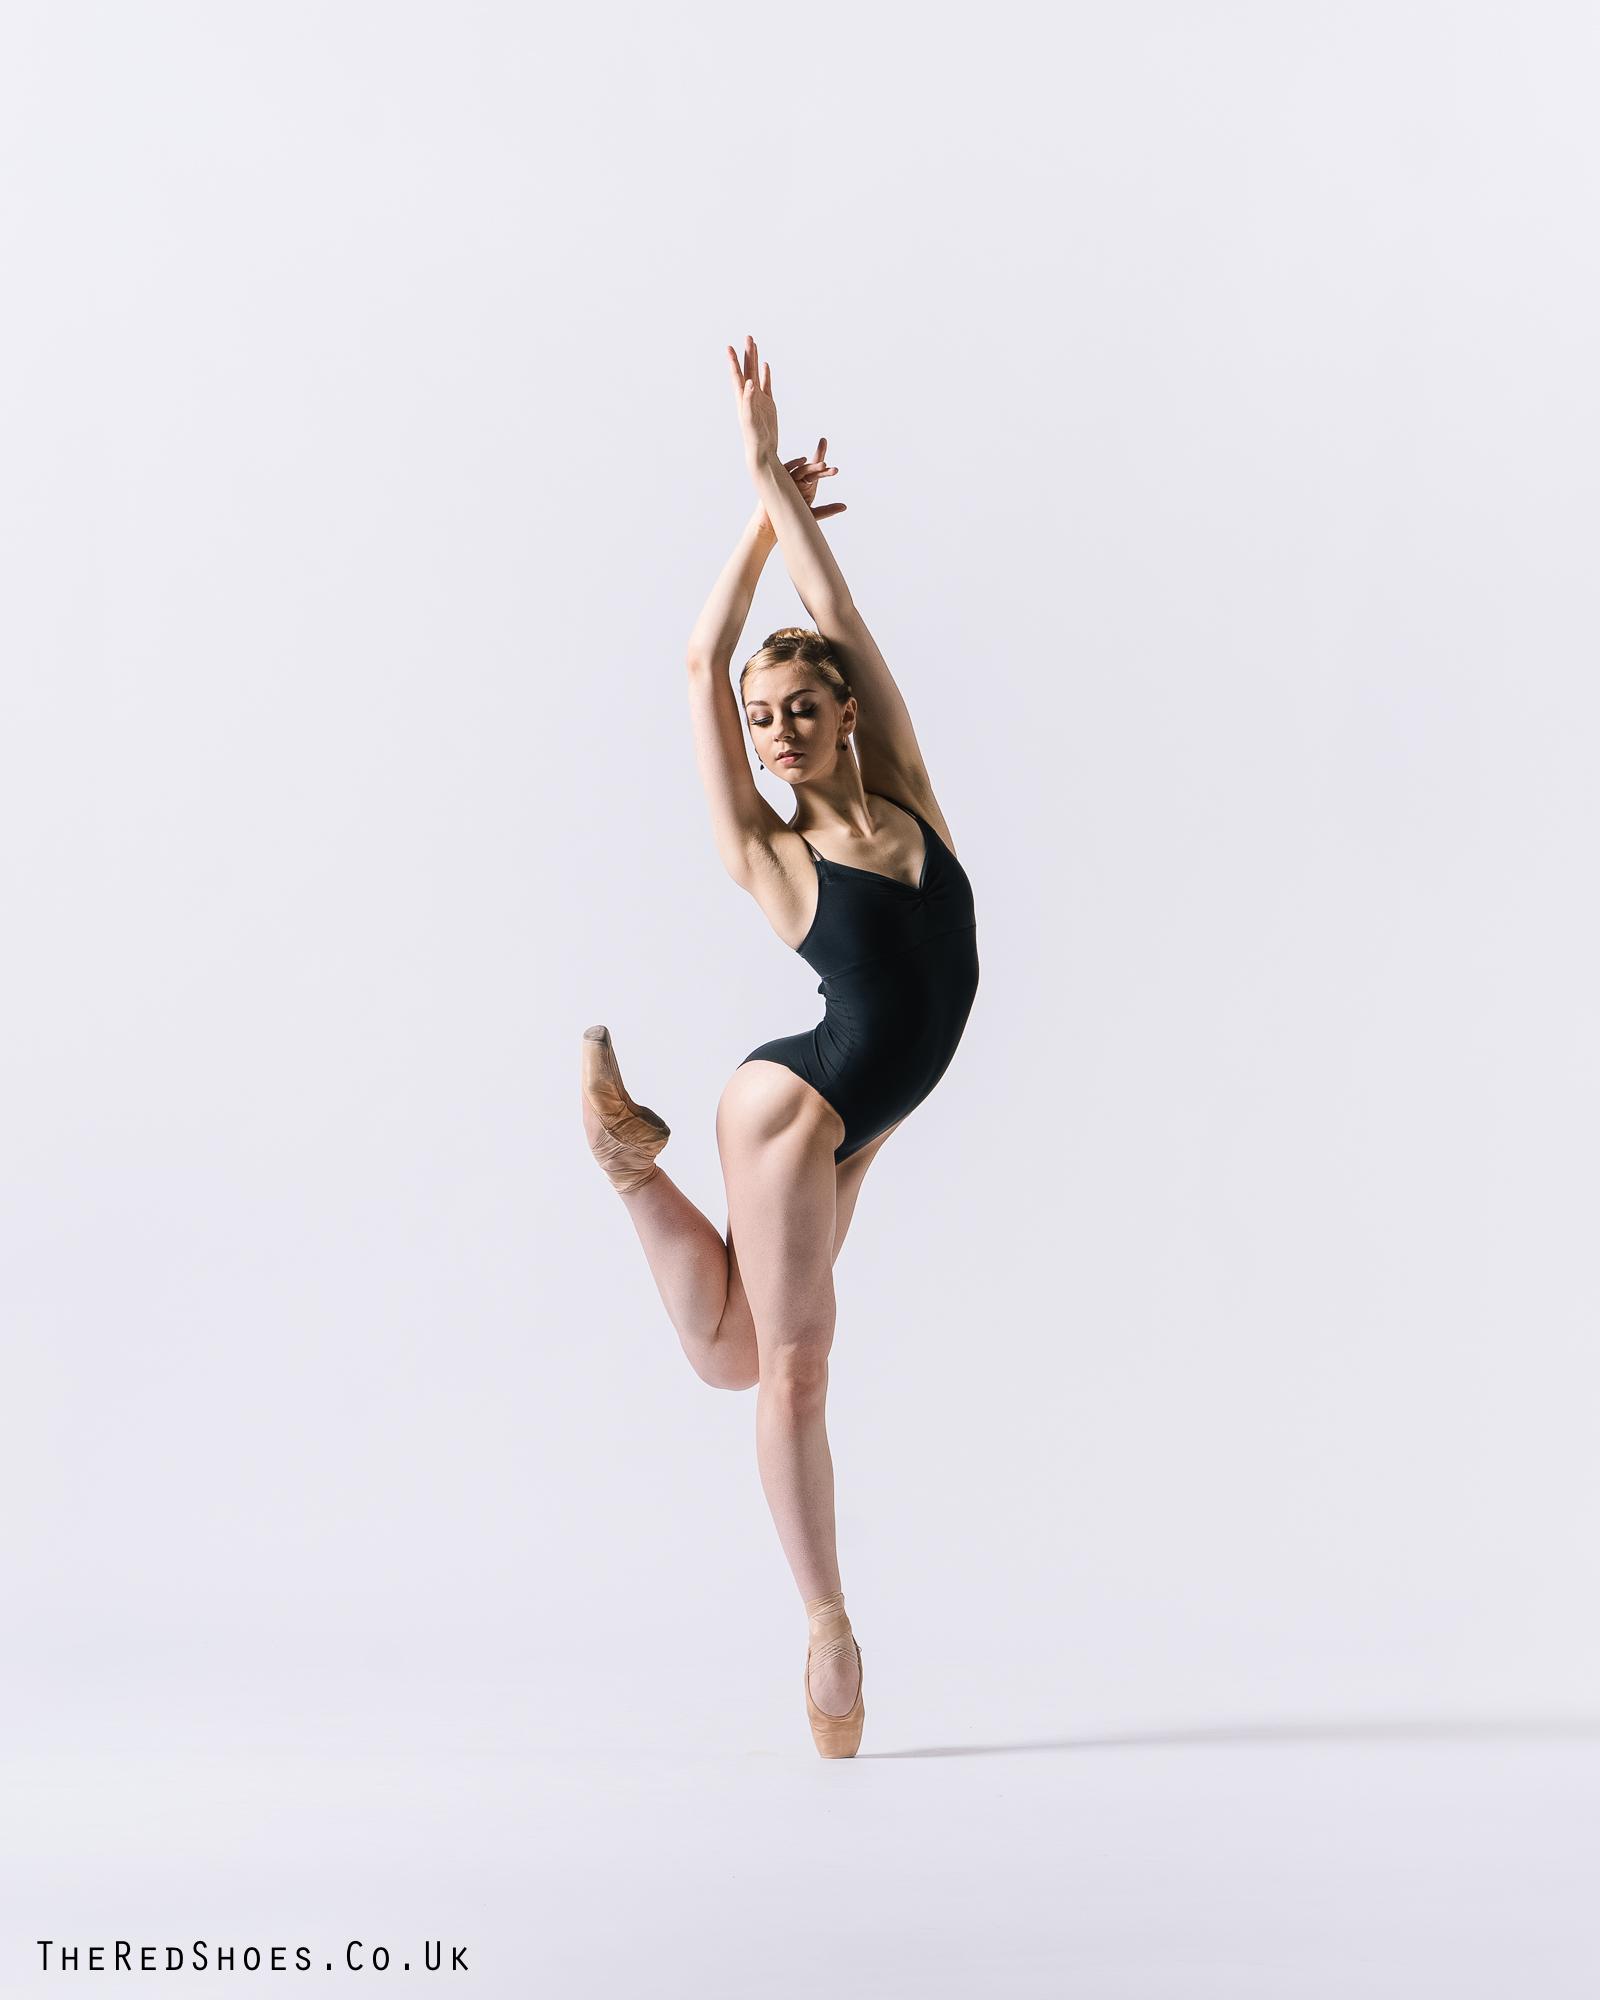 dance-photography-8.jpg